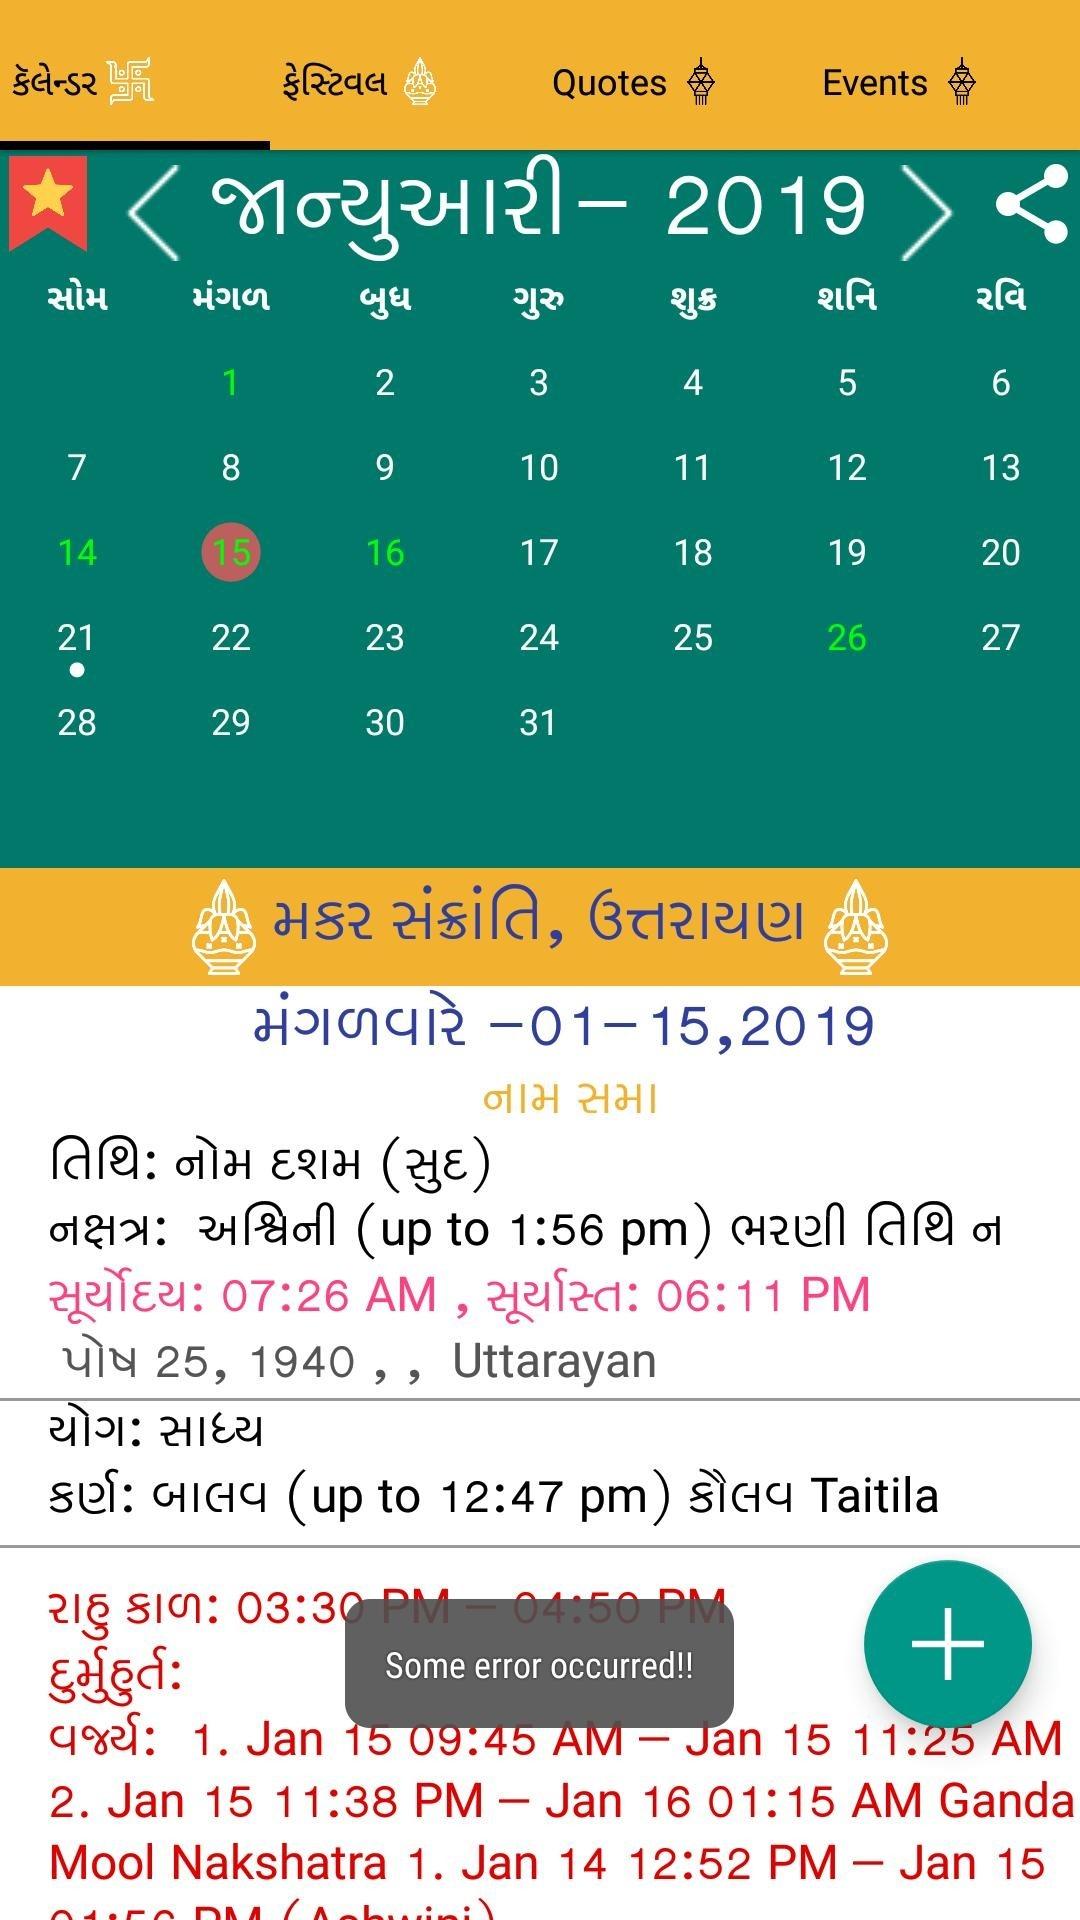 Gujarati Calendar 2019 For Android - Apk Download-Gujarati Calendar 2020 January